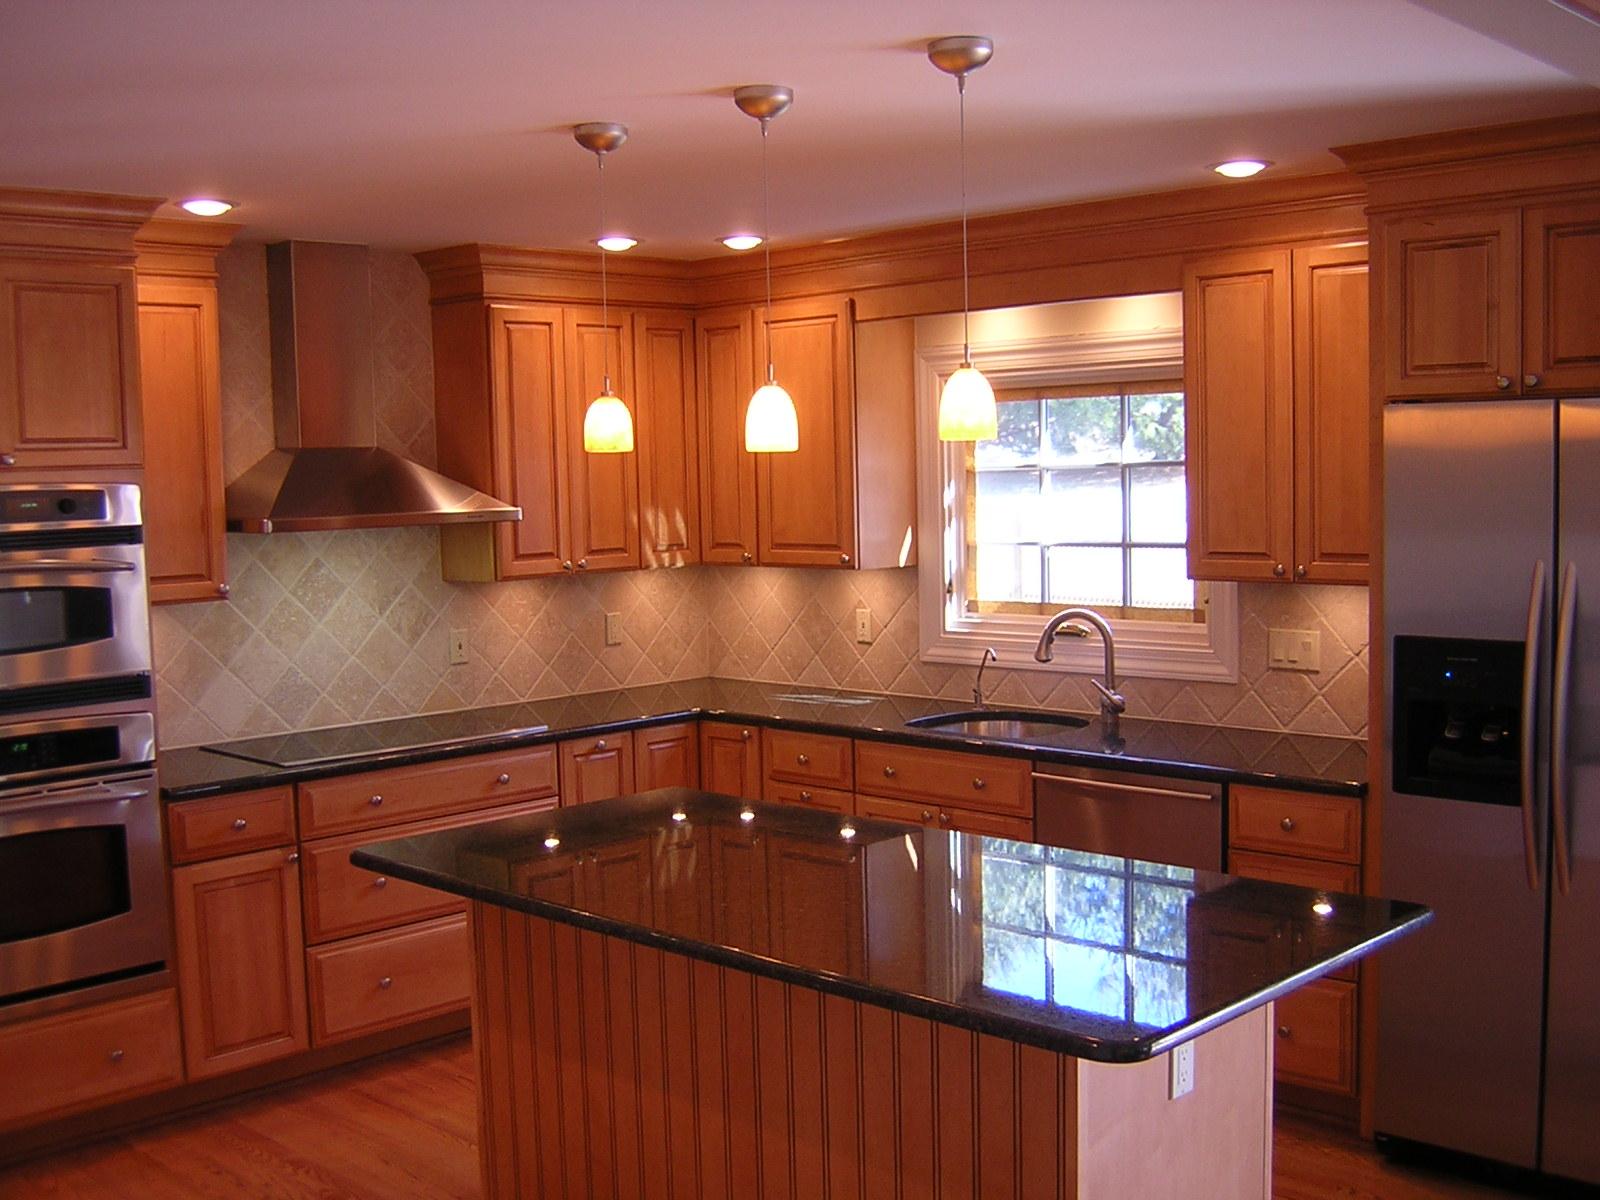 kitchen design ideas granite photo - 1